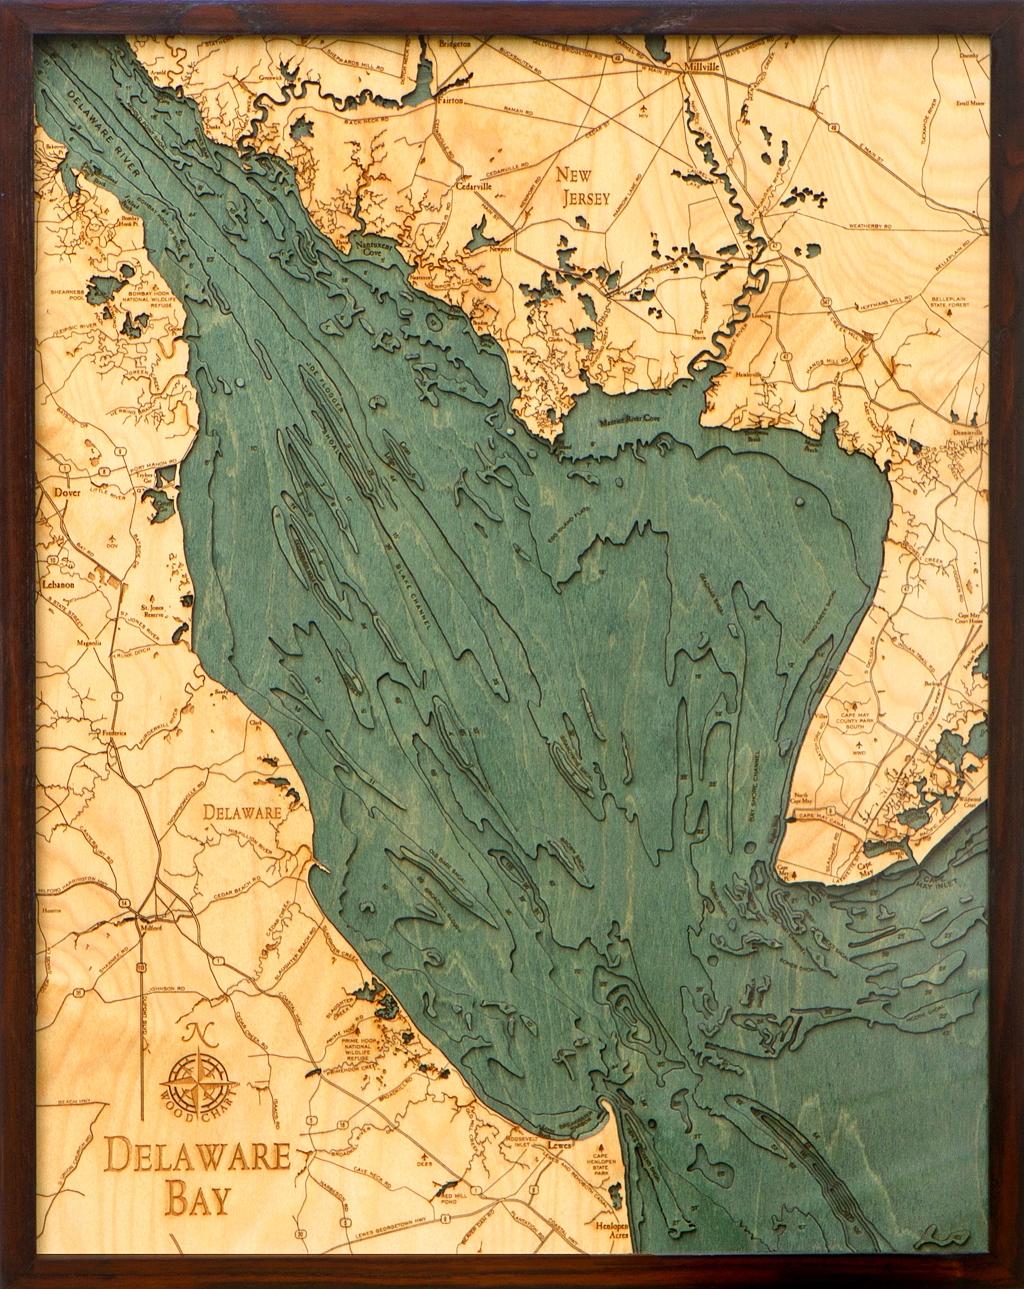 Delaware Bay Depth Chart | Delaware Bay 3D Nautical Map